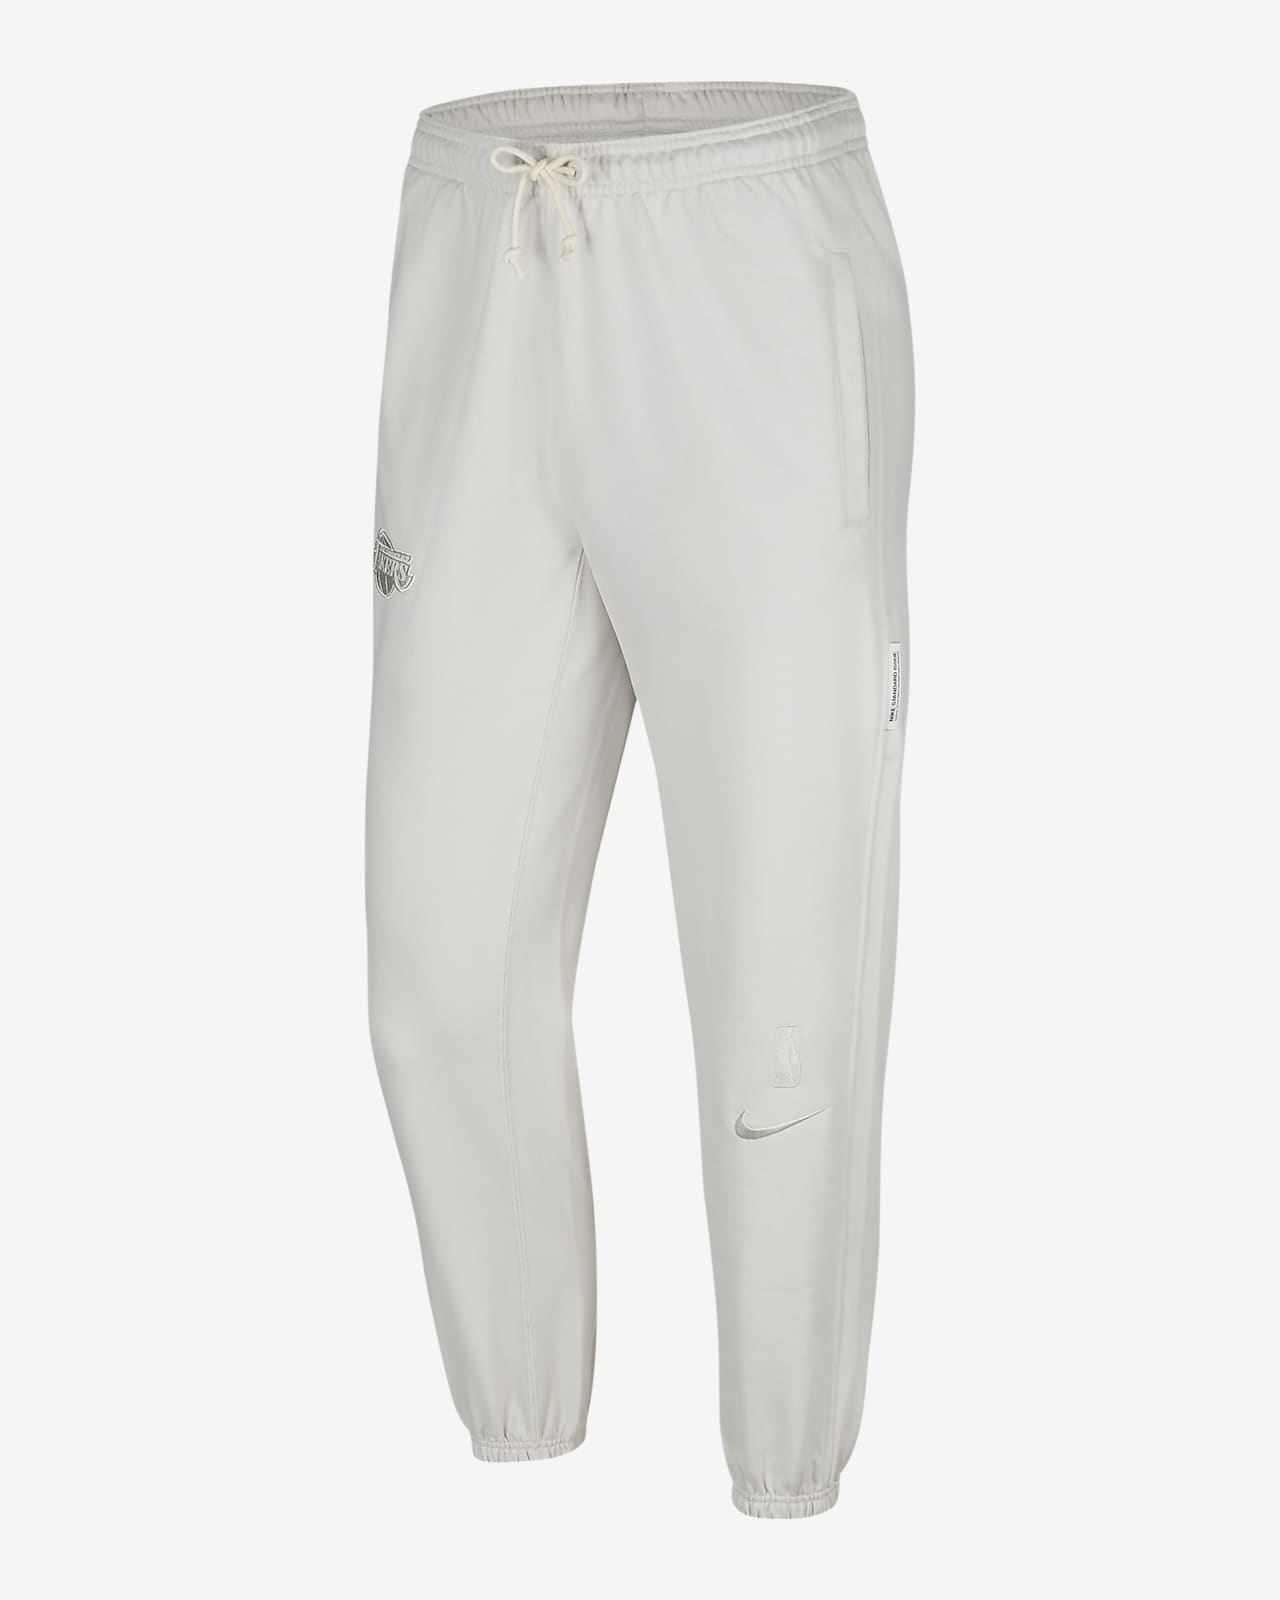 Lakers Standard Issue Men's Nike Dri-FIT NBA Trousers